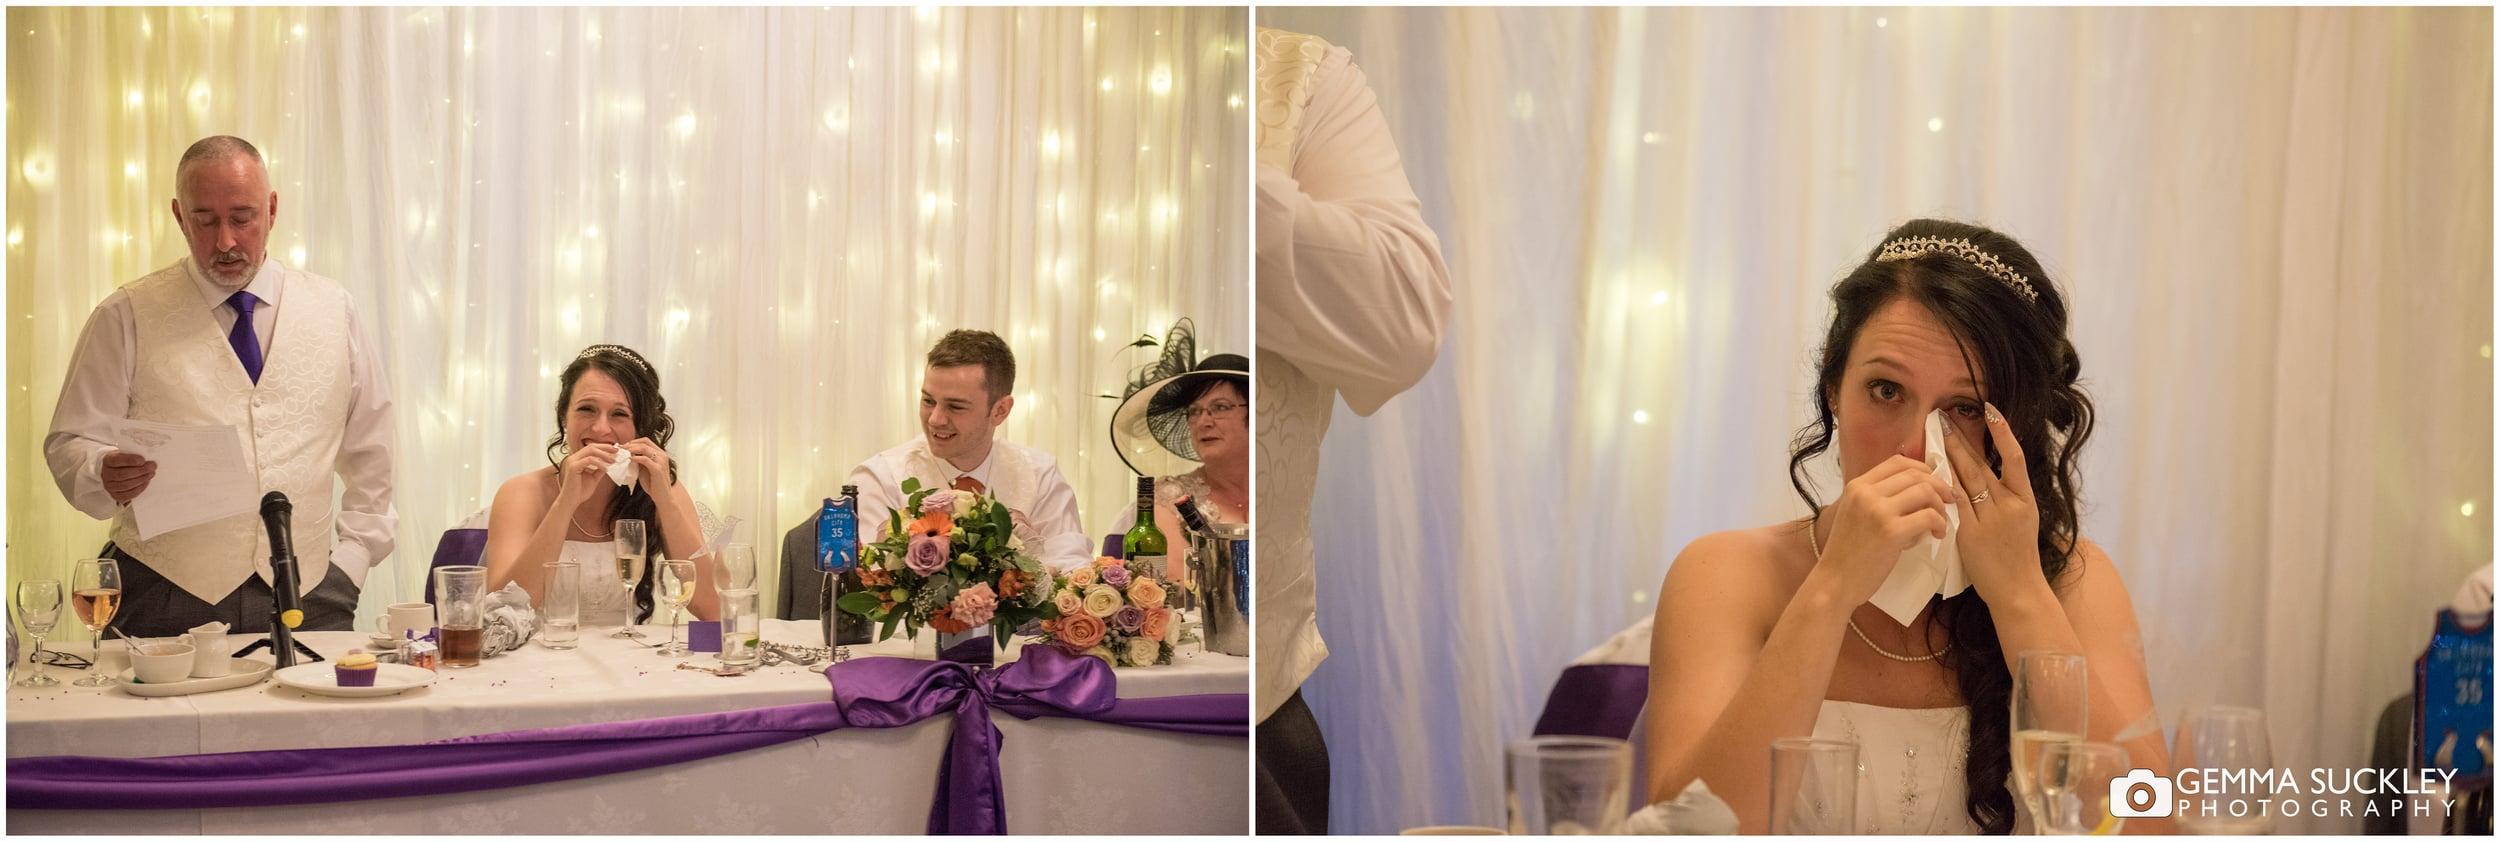 wedding-speeches-baildon.jpg